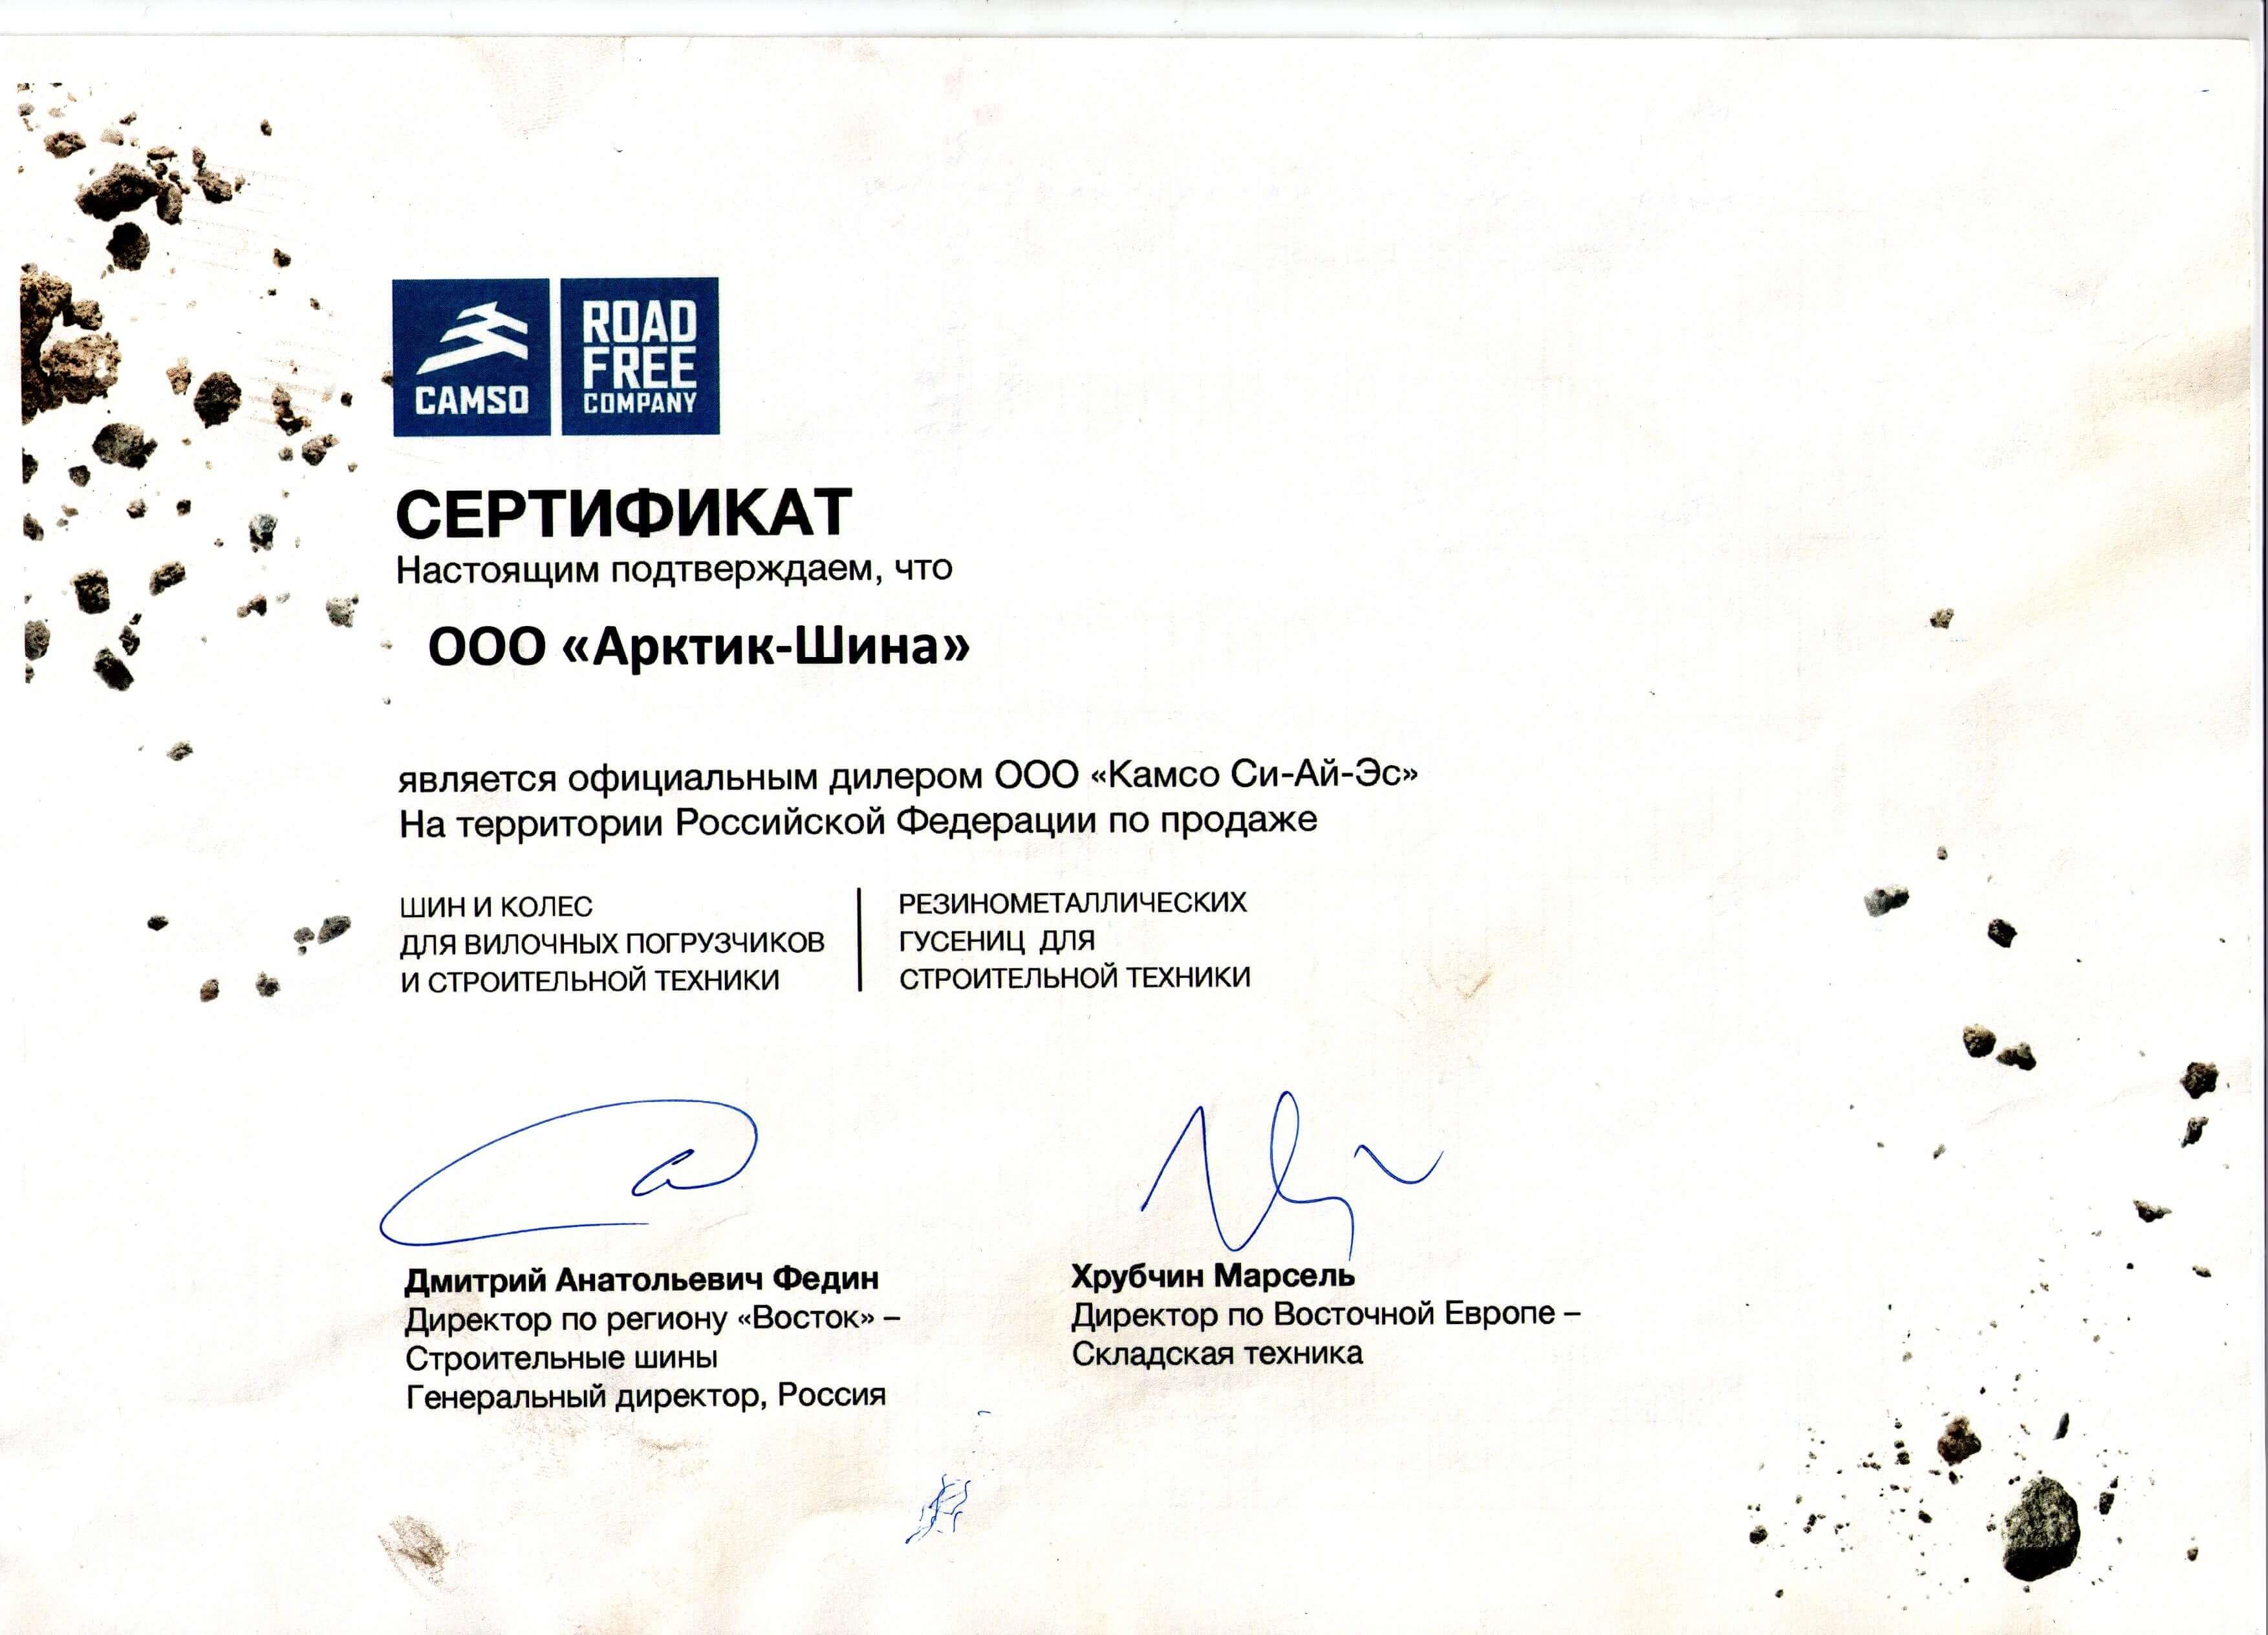 Сертификат Camso 001